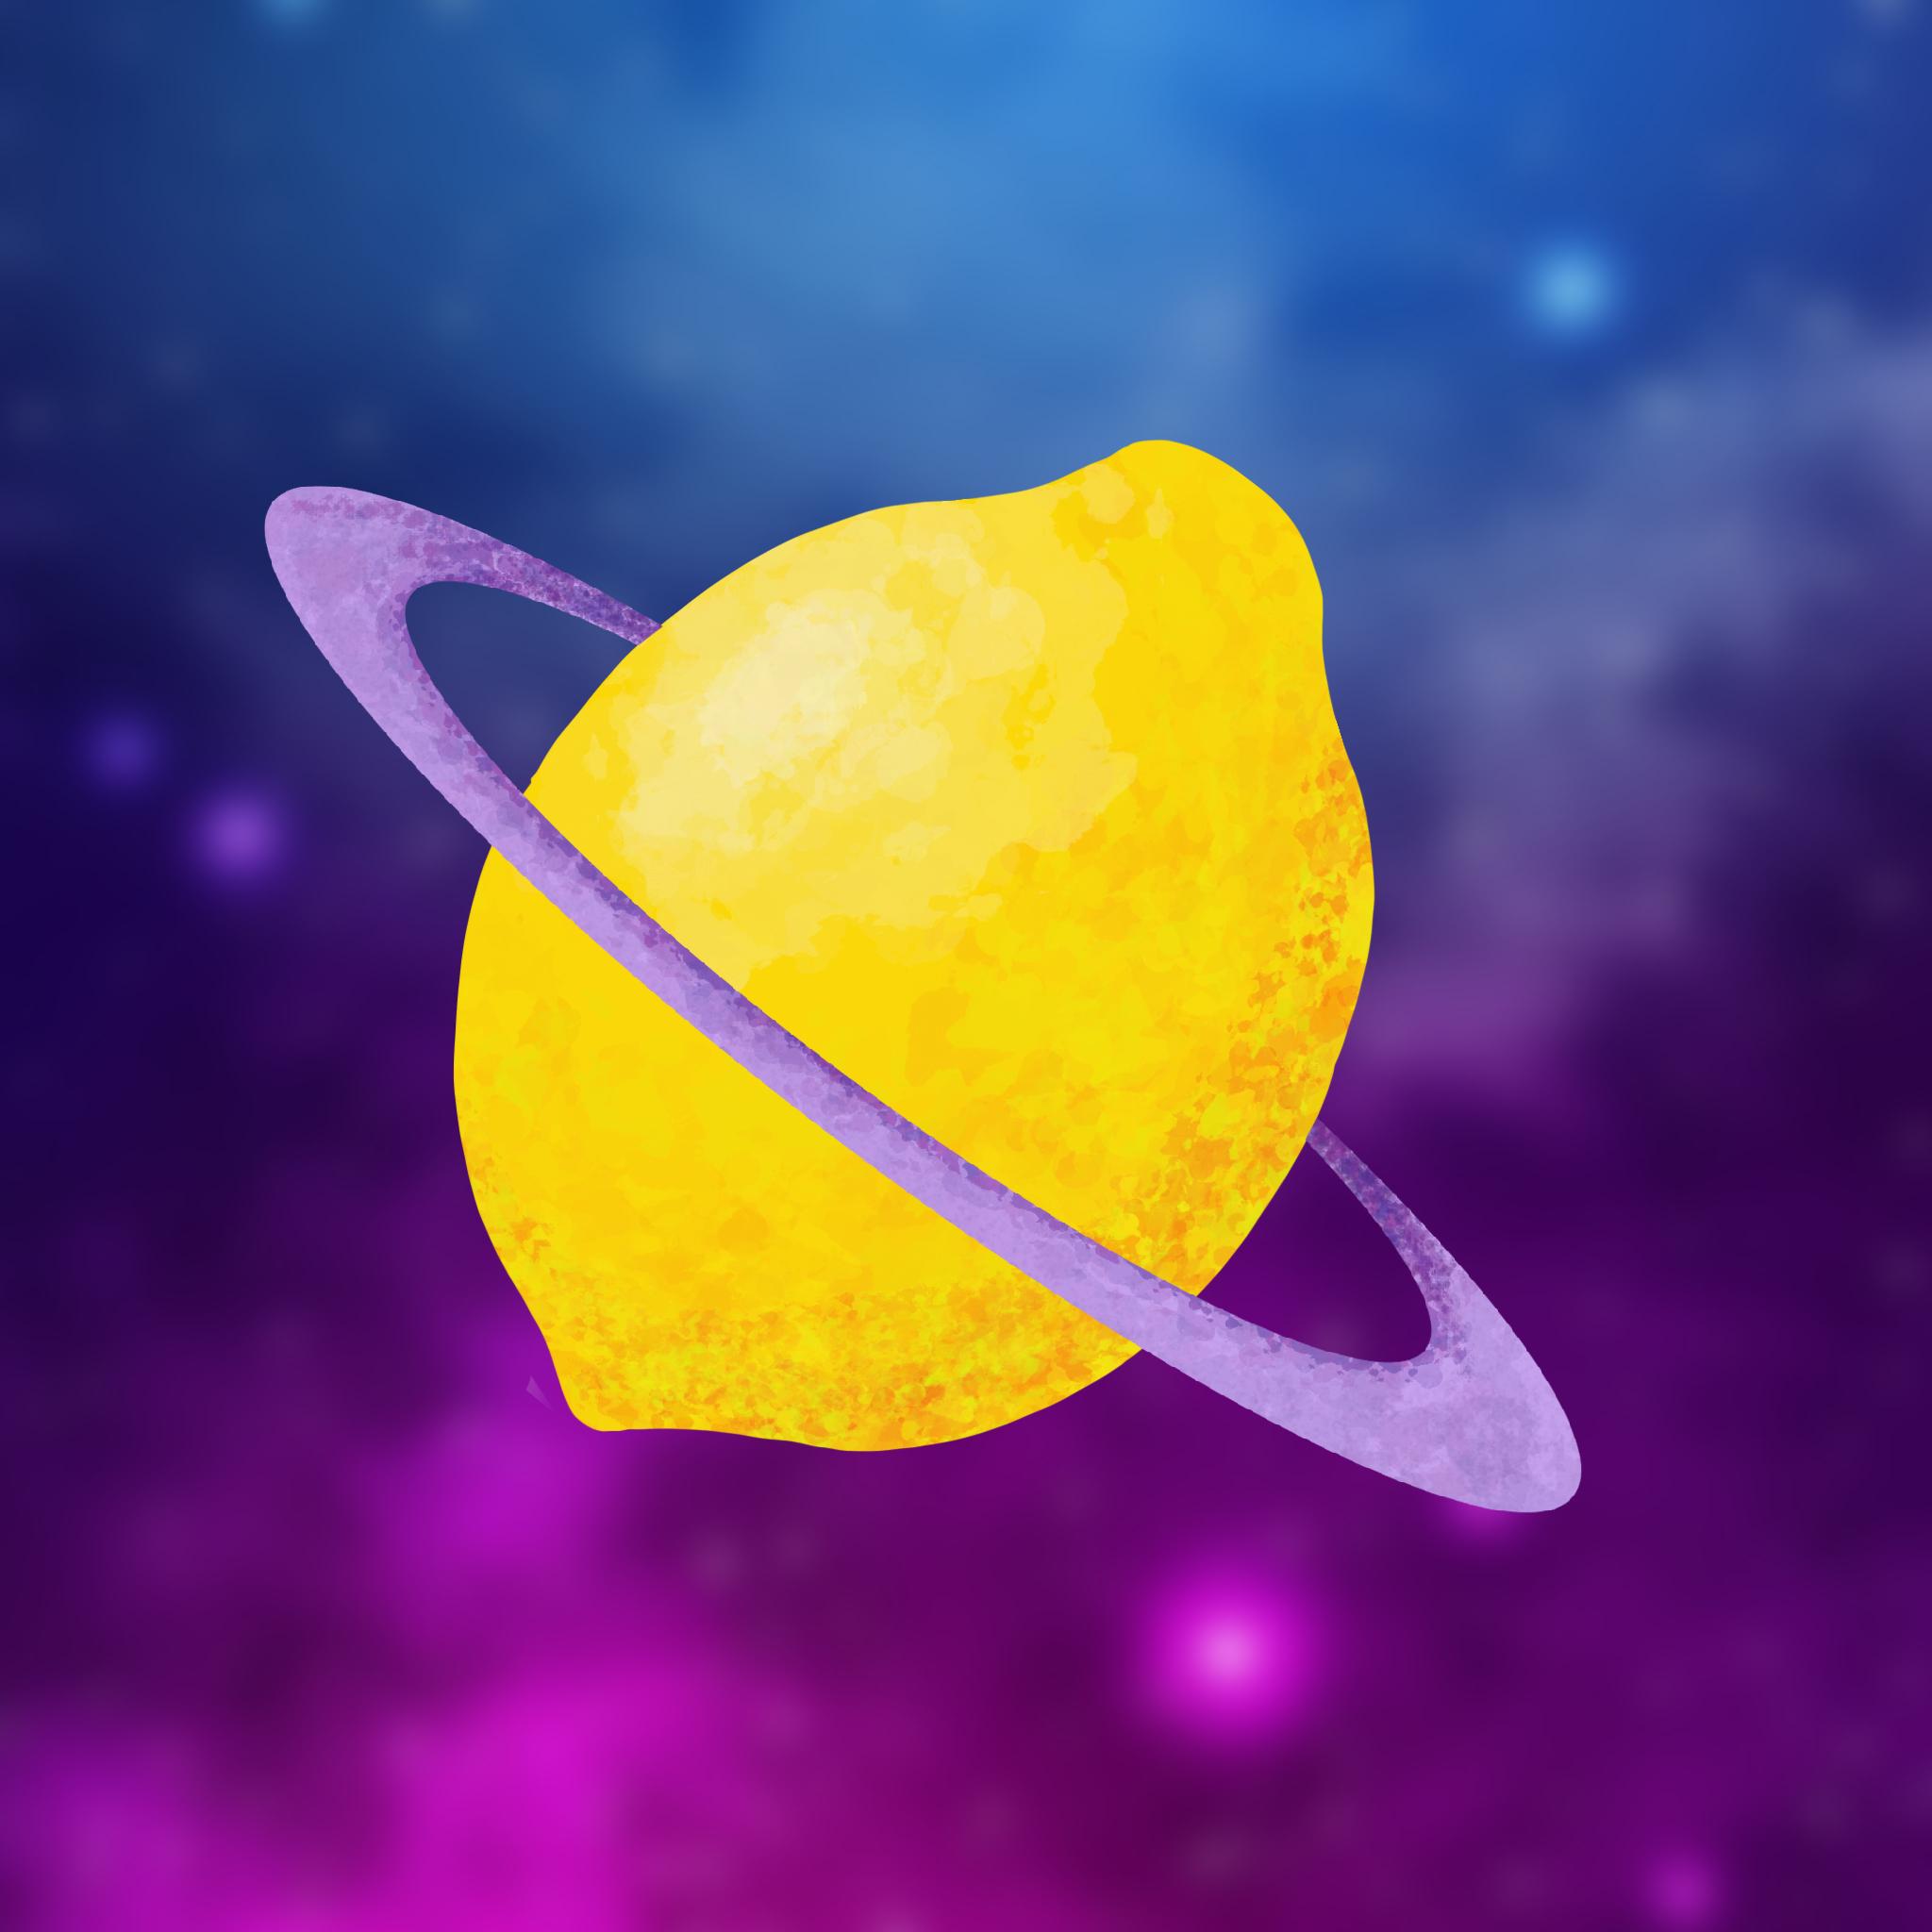 Cosmic Lemon